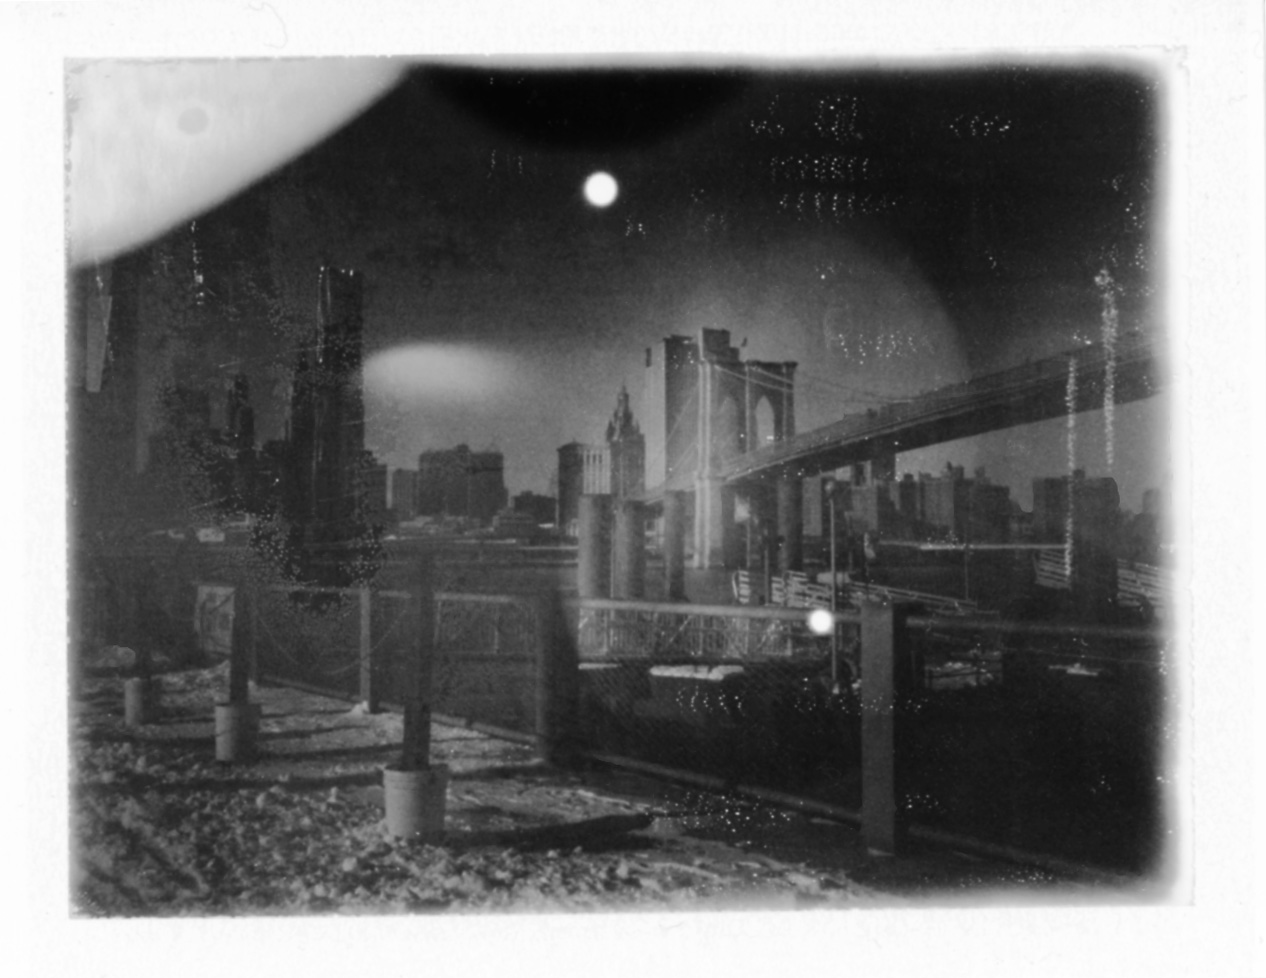 Polaroid180_web.jpg